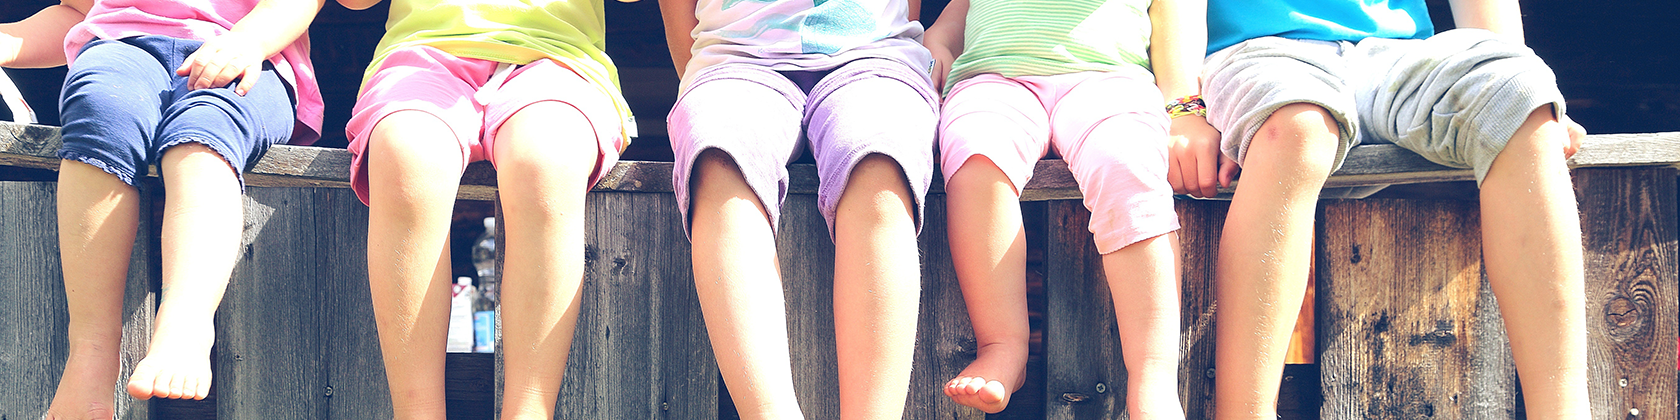 Kinder sitzen auf Zaun